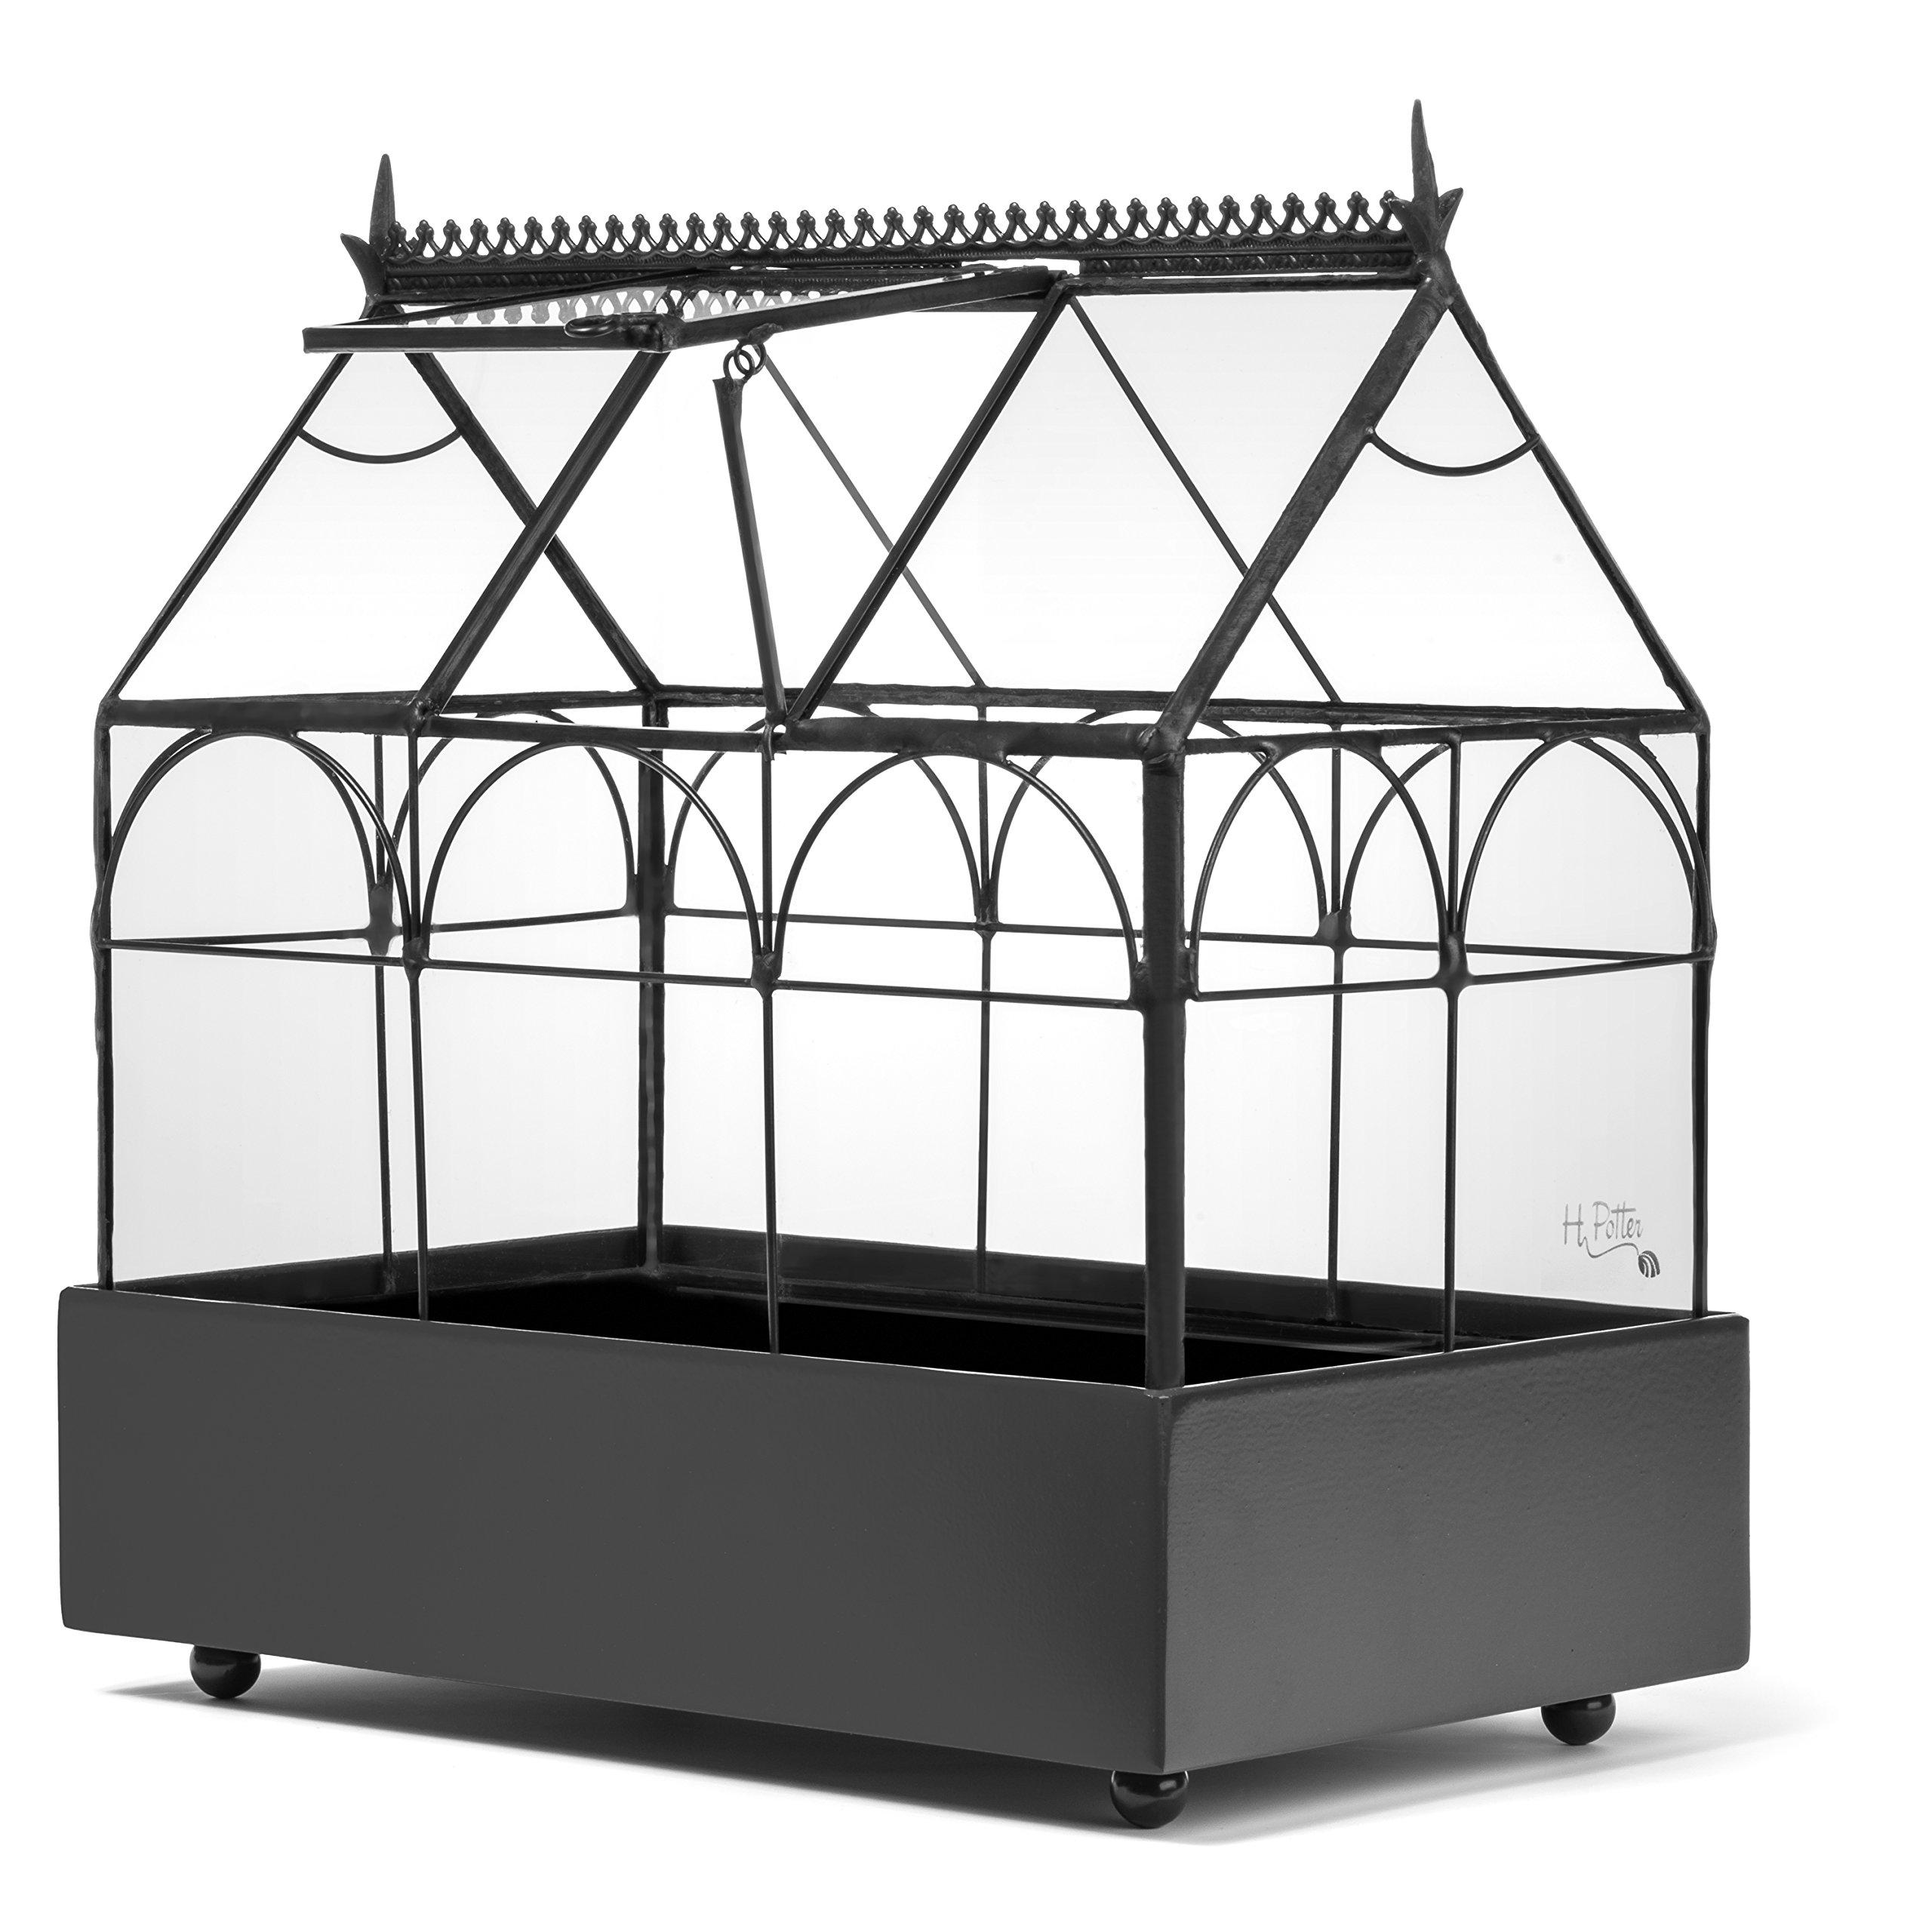 H Potter Plant Terrarium Container Wardian Case Indoor Glass Succulent Planter 65-1